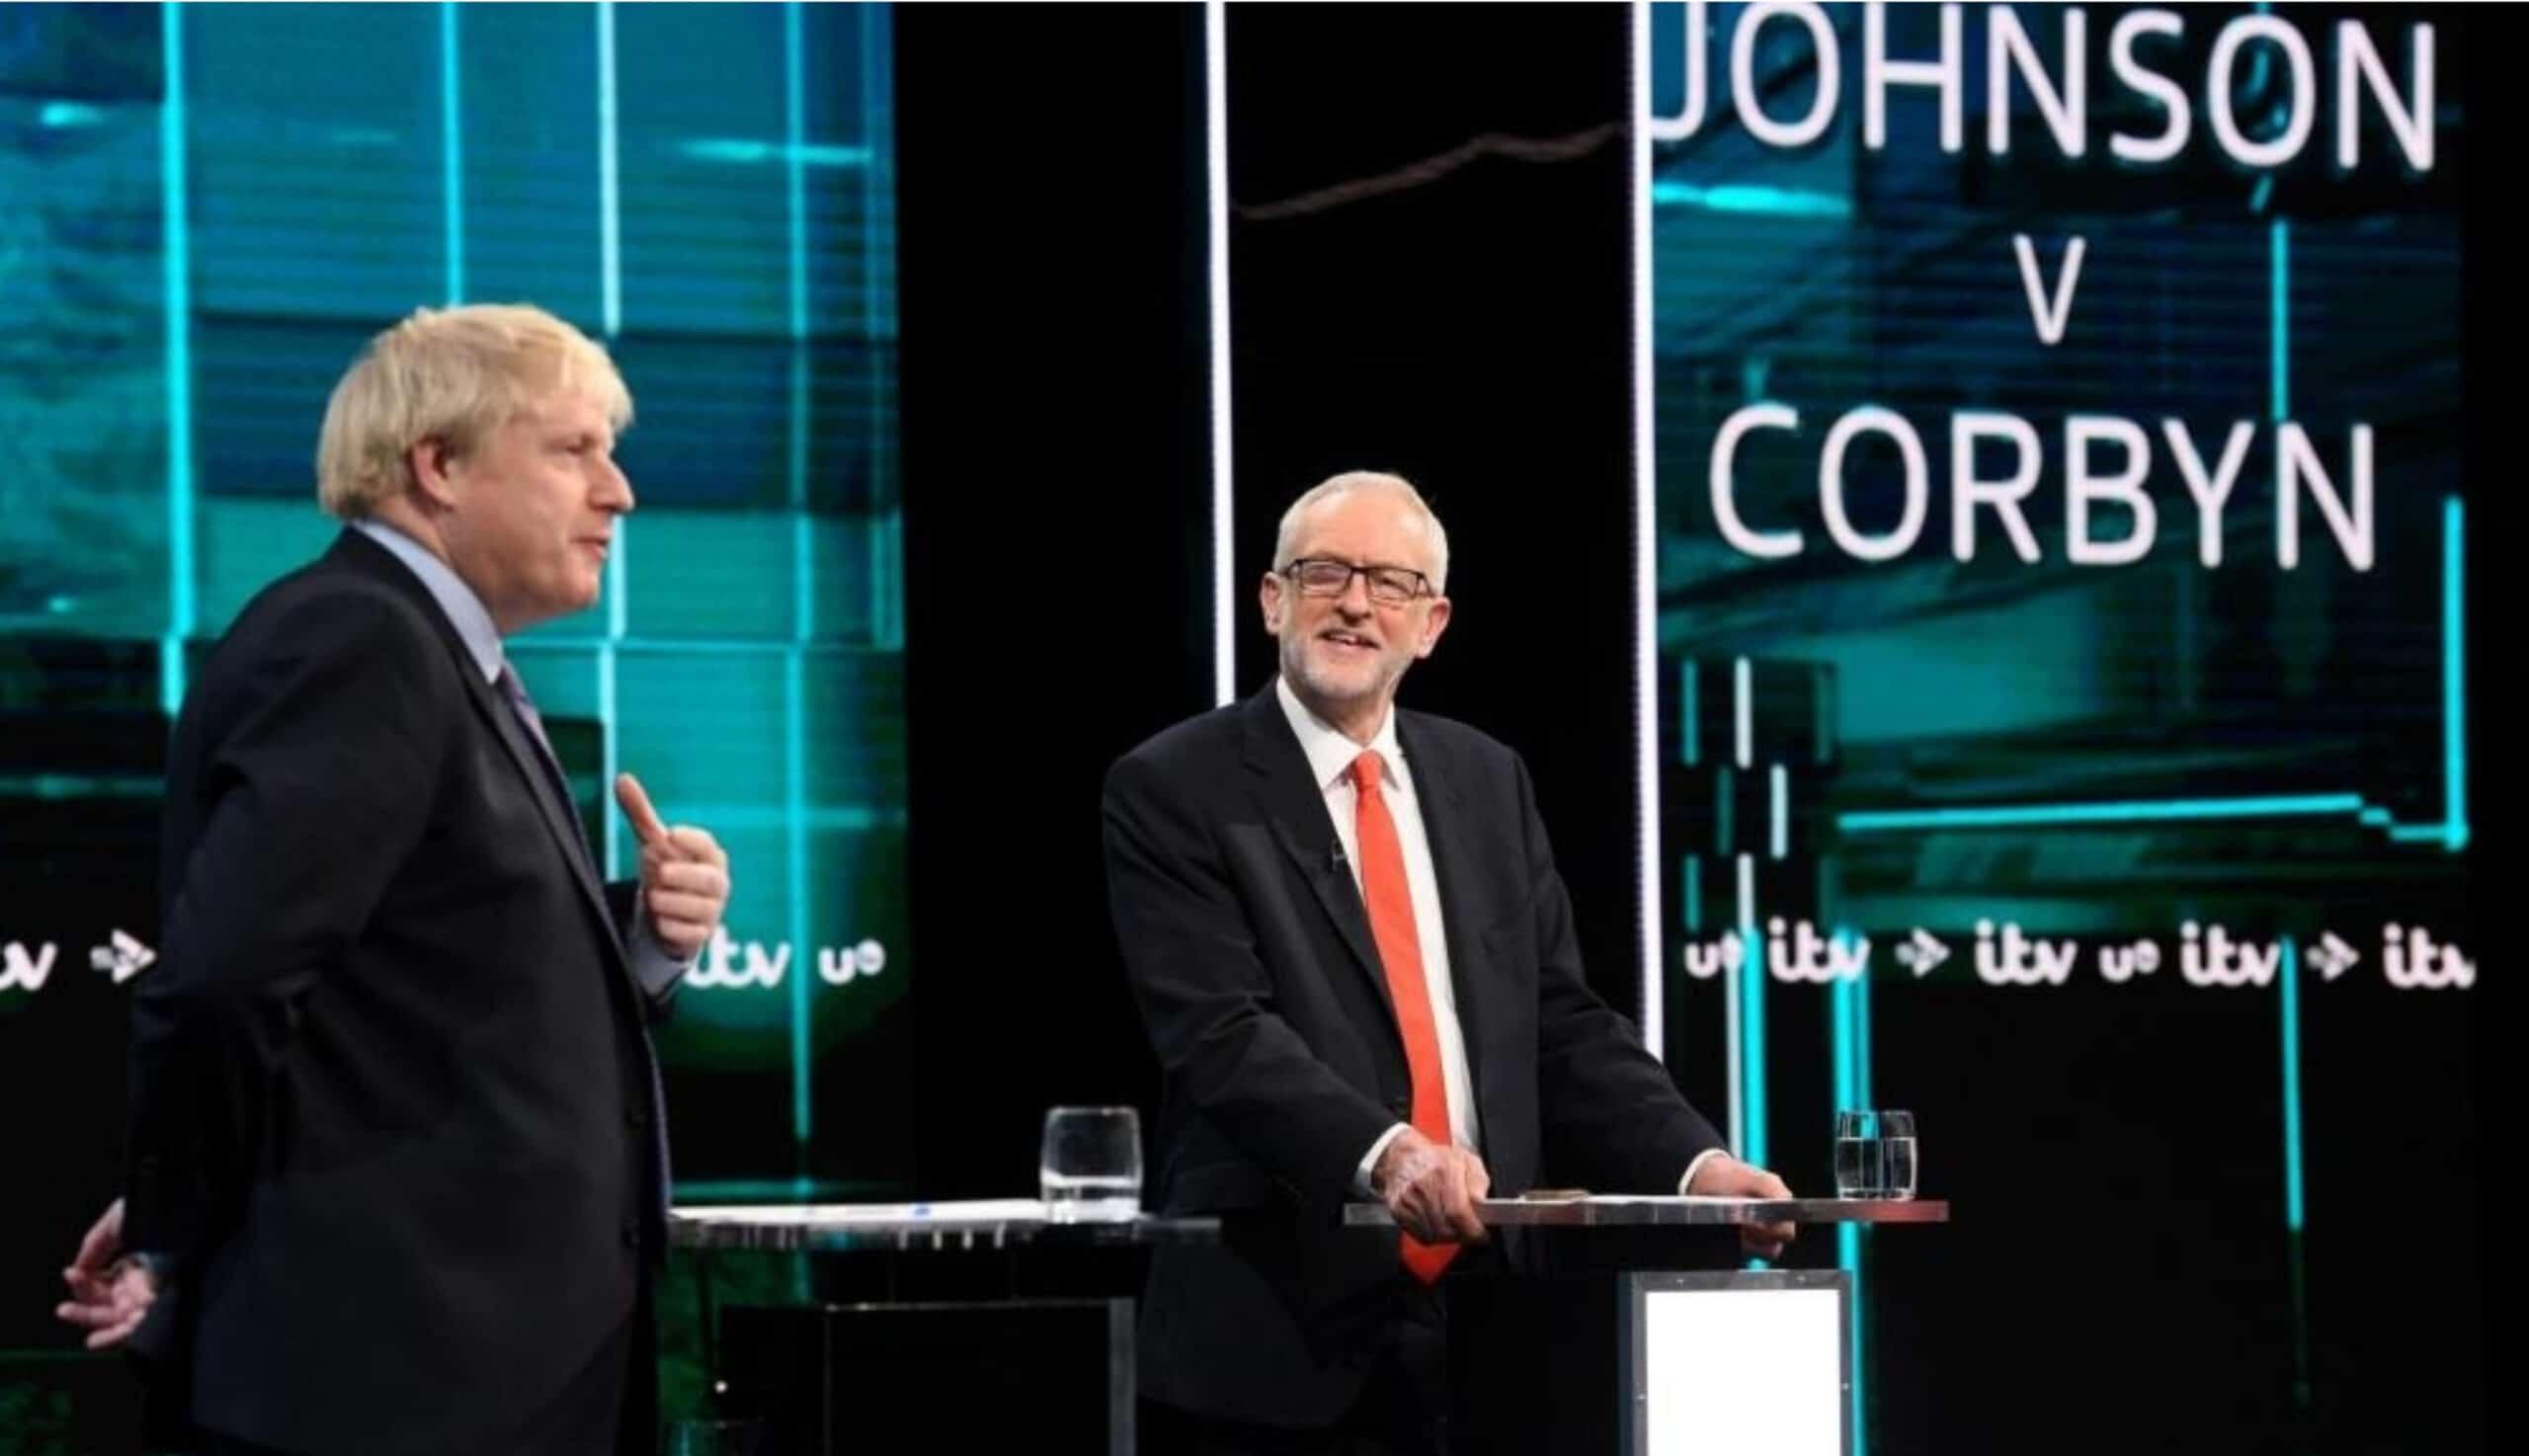 Corbyn - Johnson TV debate